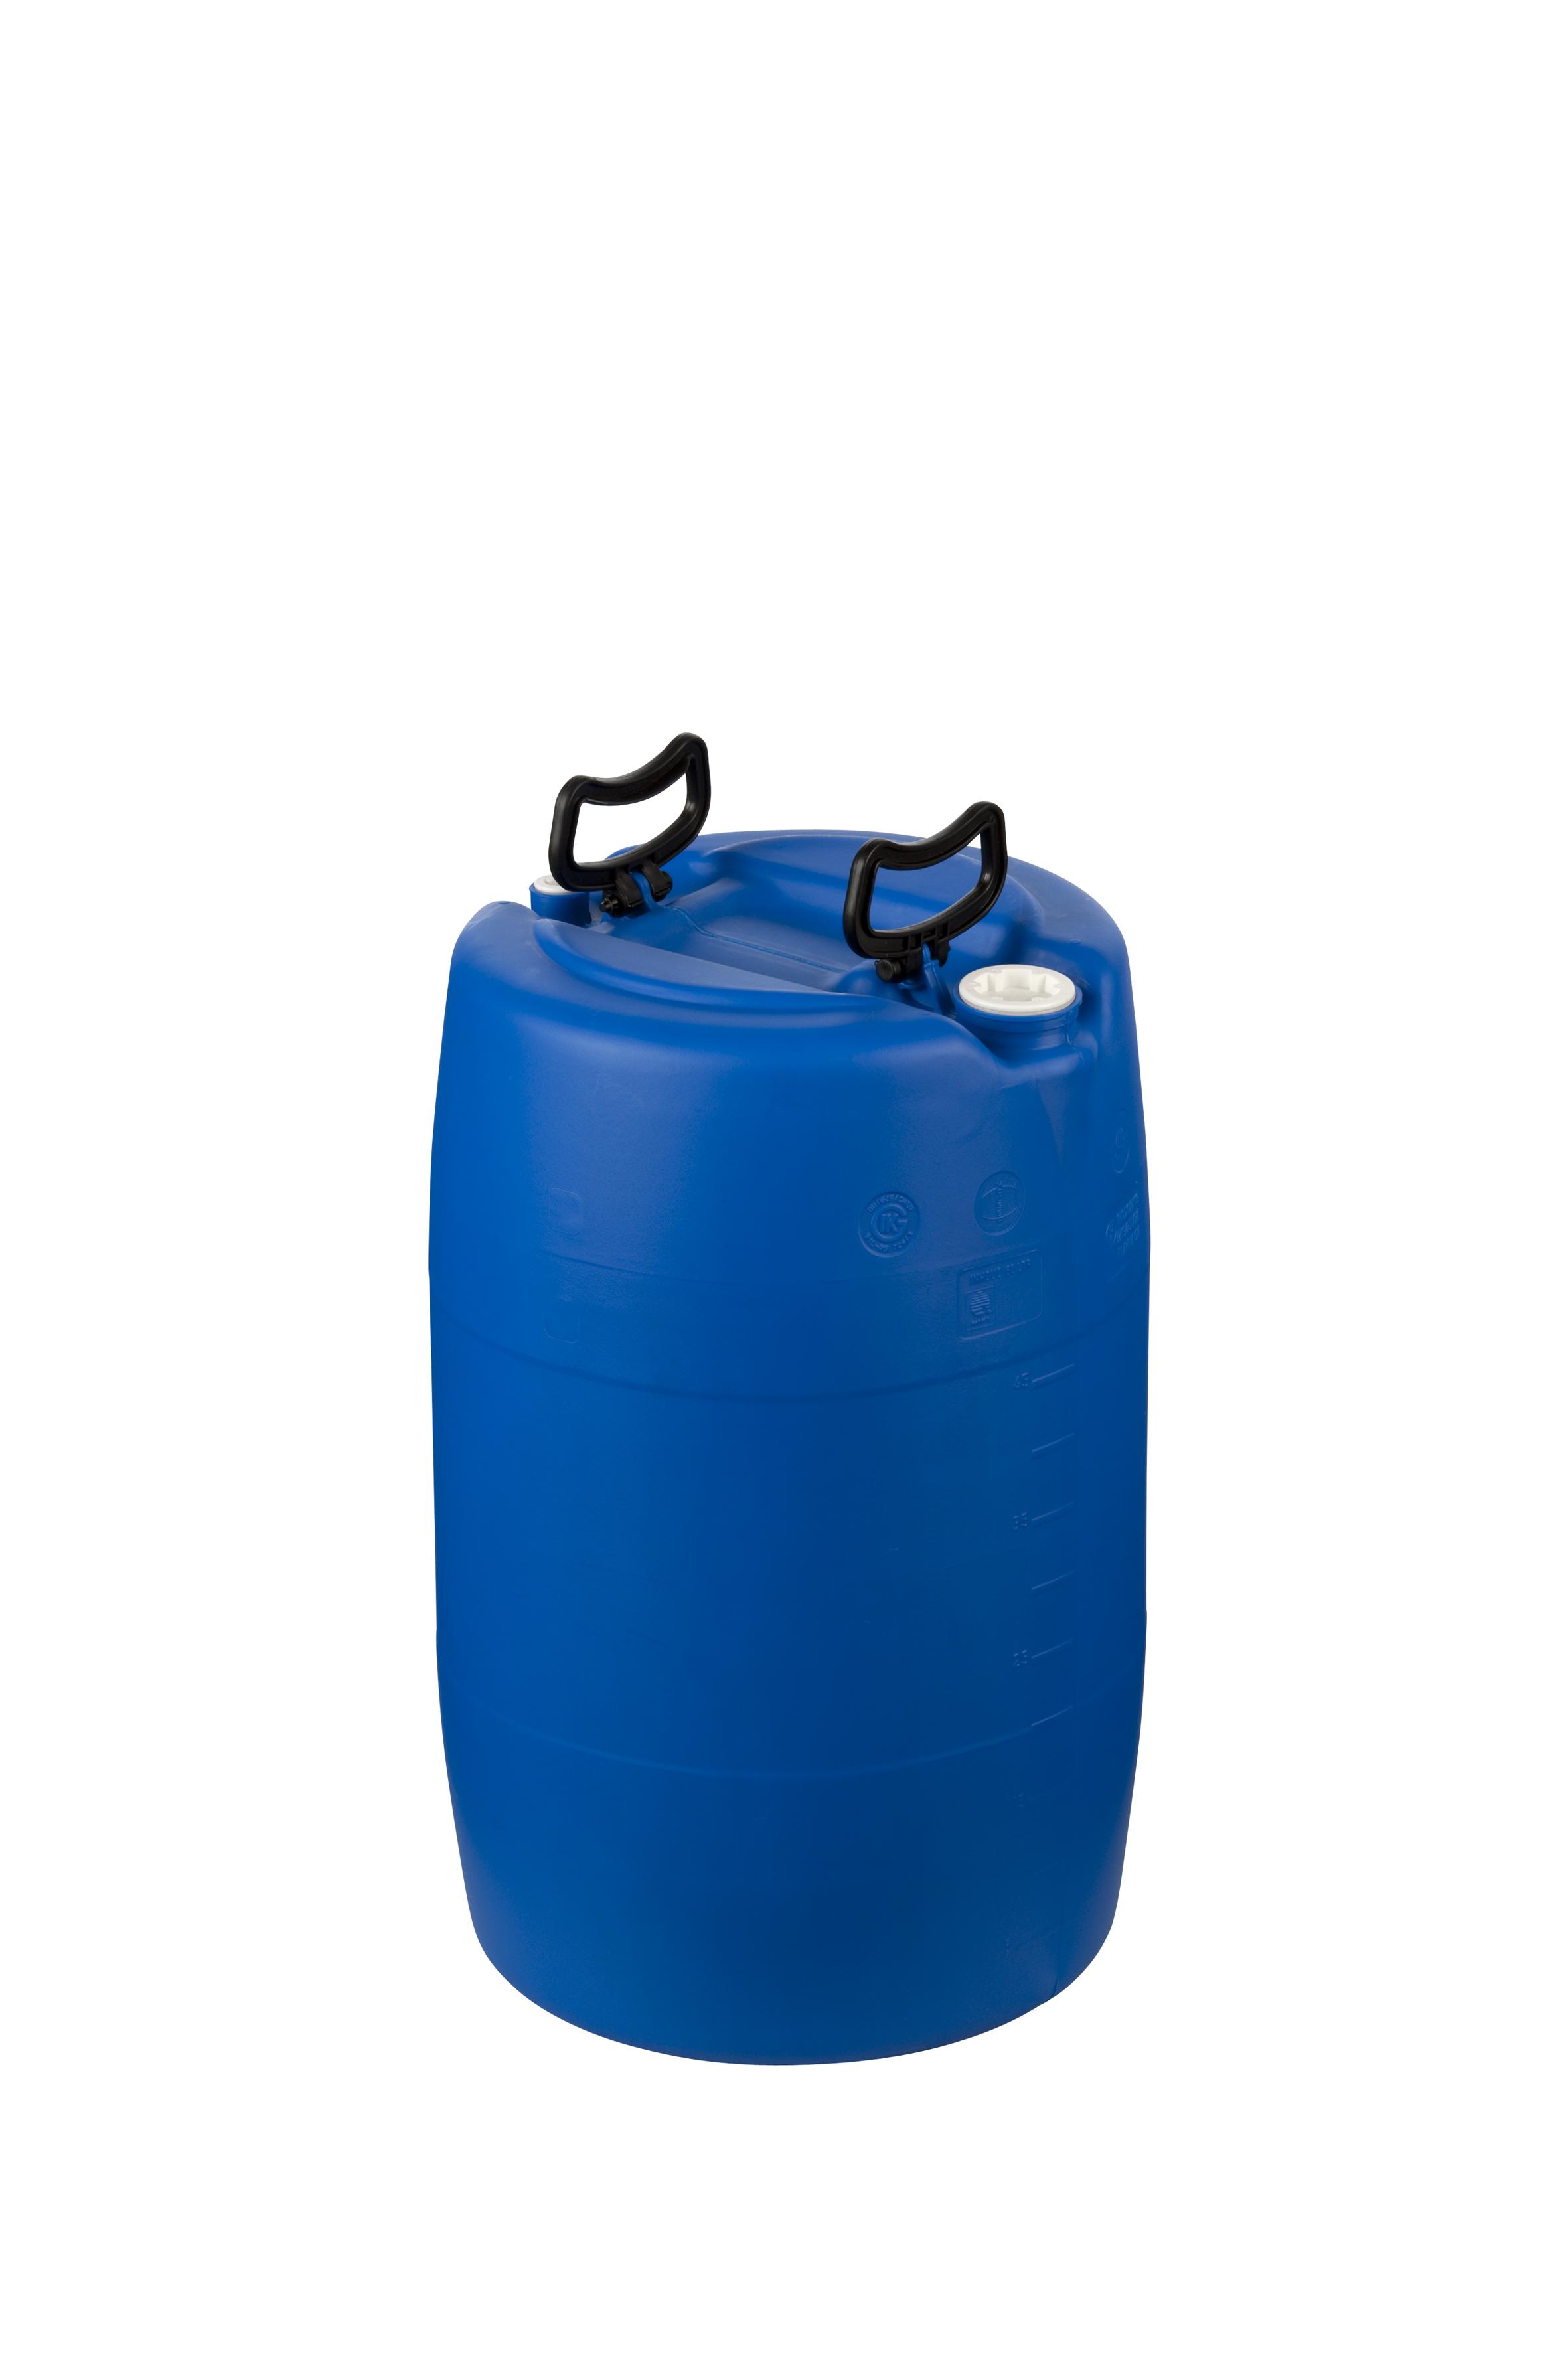 Kunstof vaten 60 liter